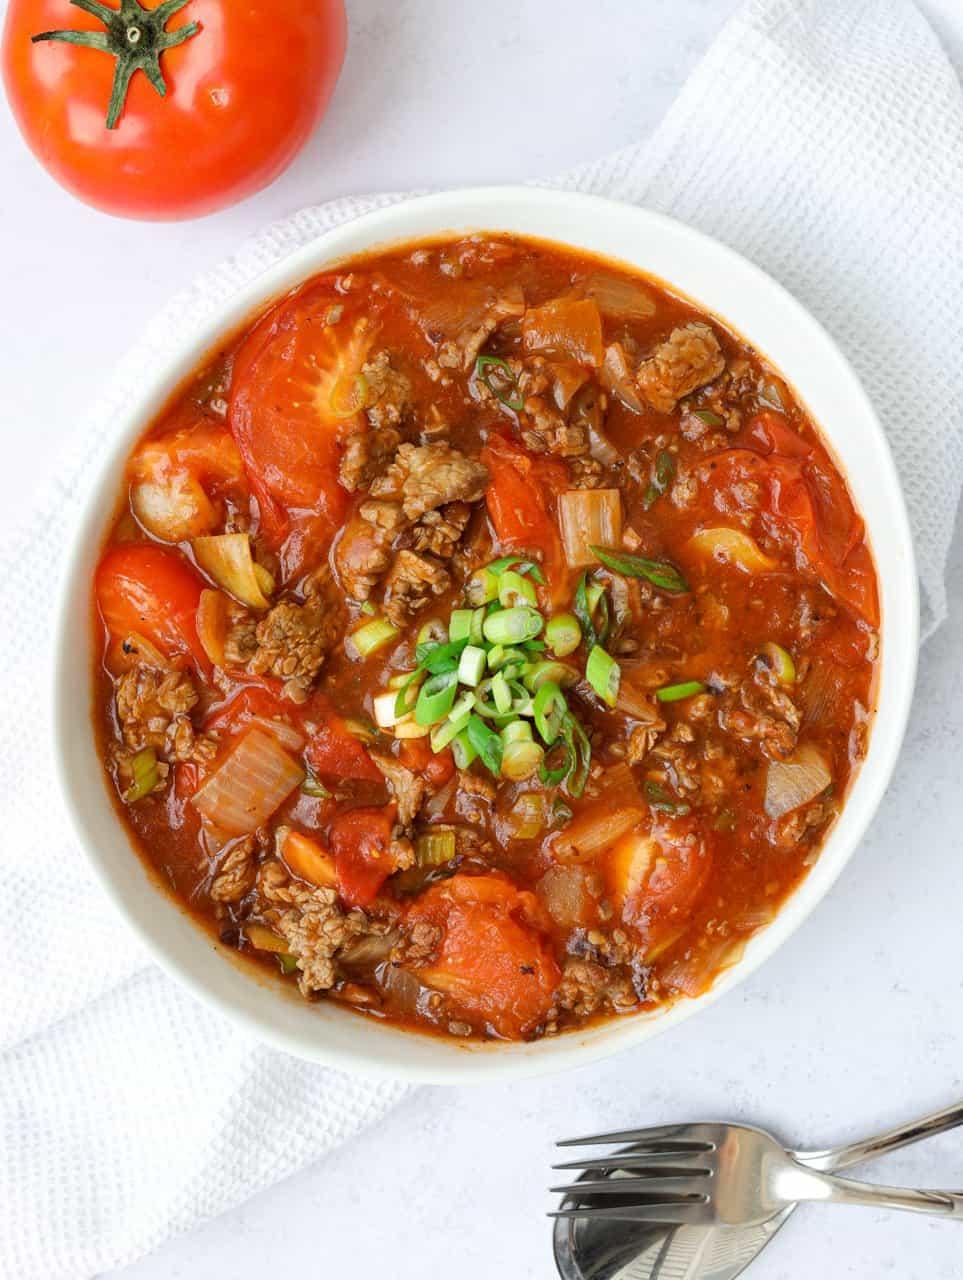 Chinese Tomato Beef Stir-fry